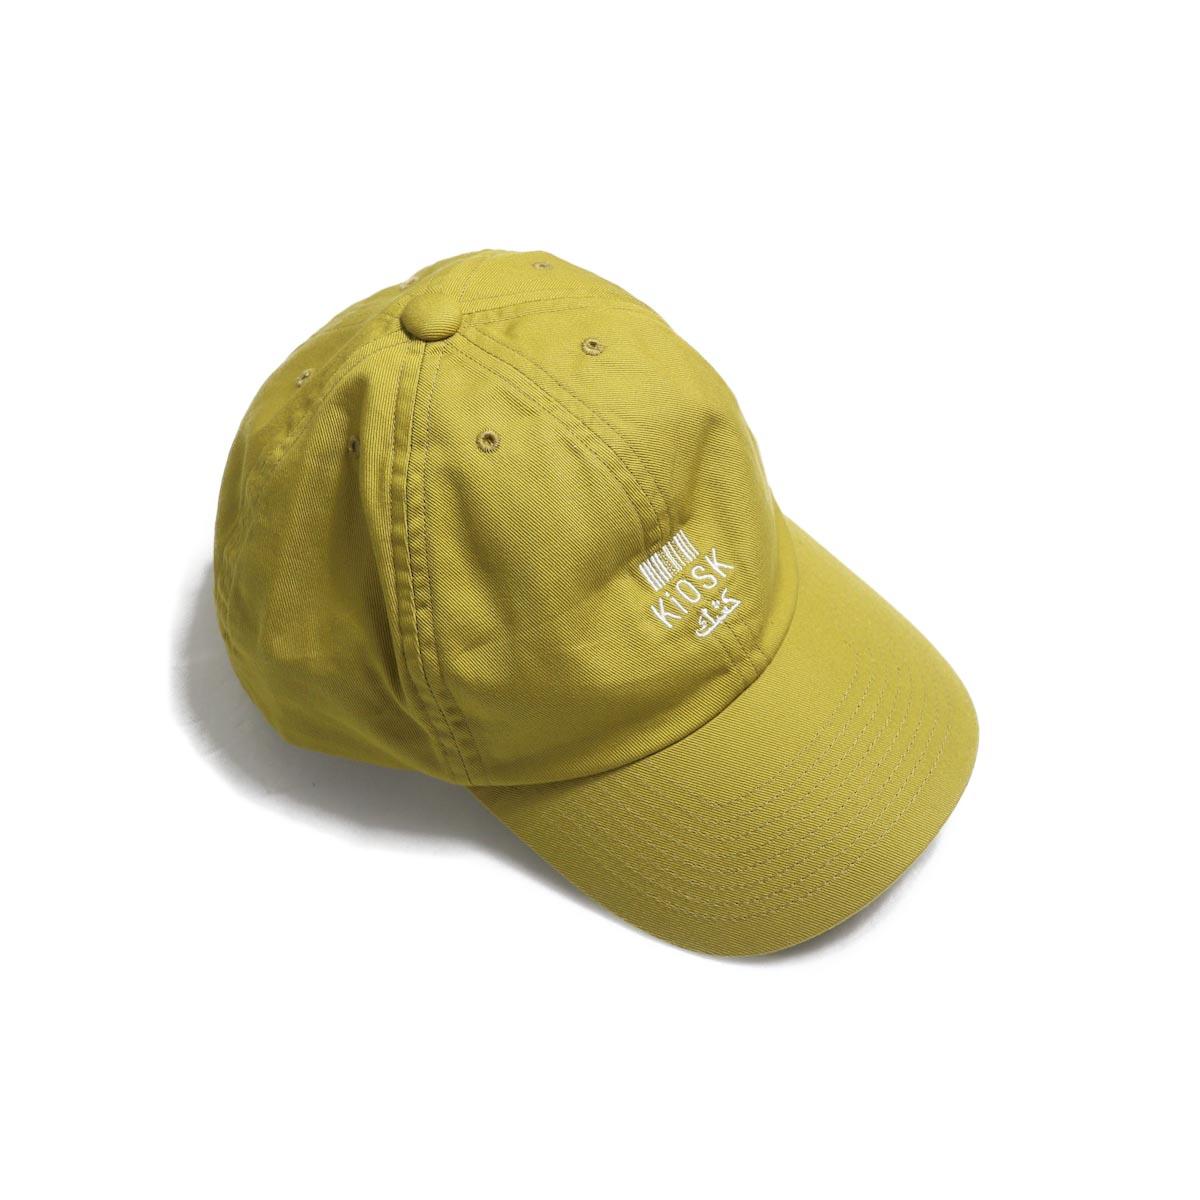 COMESANDGOES / Embroidery Cap (NO.14520) mustard